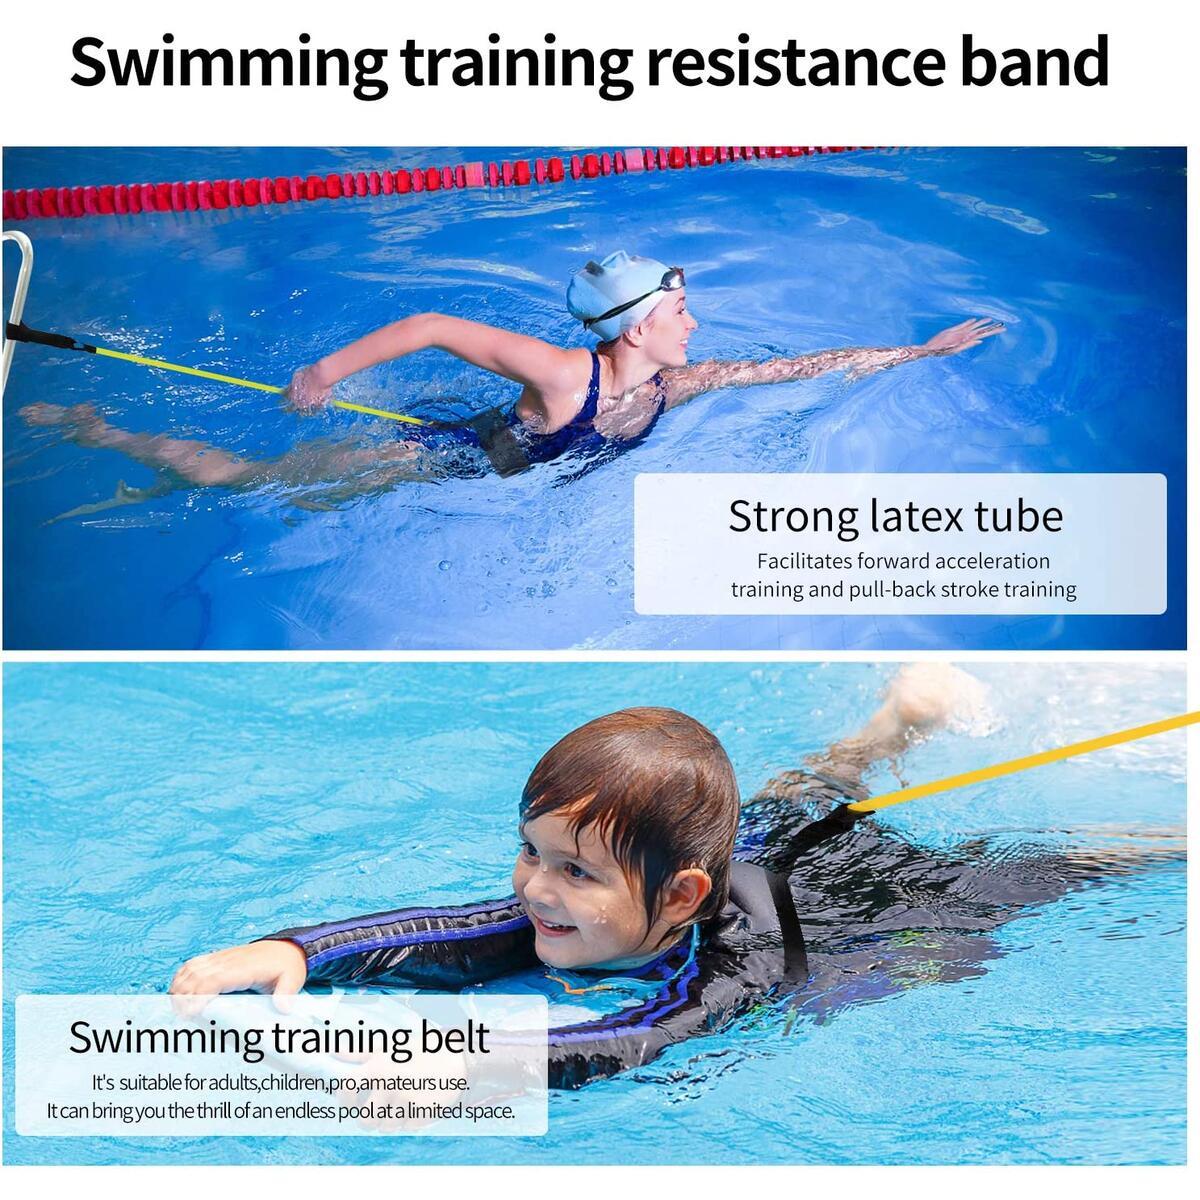 Swim Training Belt Tether Swimming Leash Bungee Cords 4M Swim Stationary Pool Resistance Bands Swim Harness Static Belt for Adult Kids